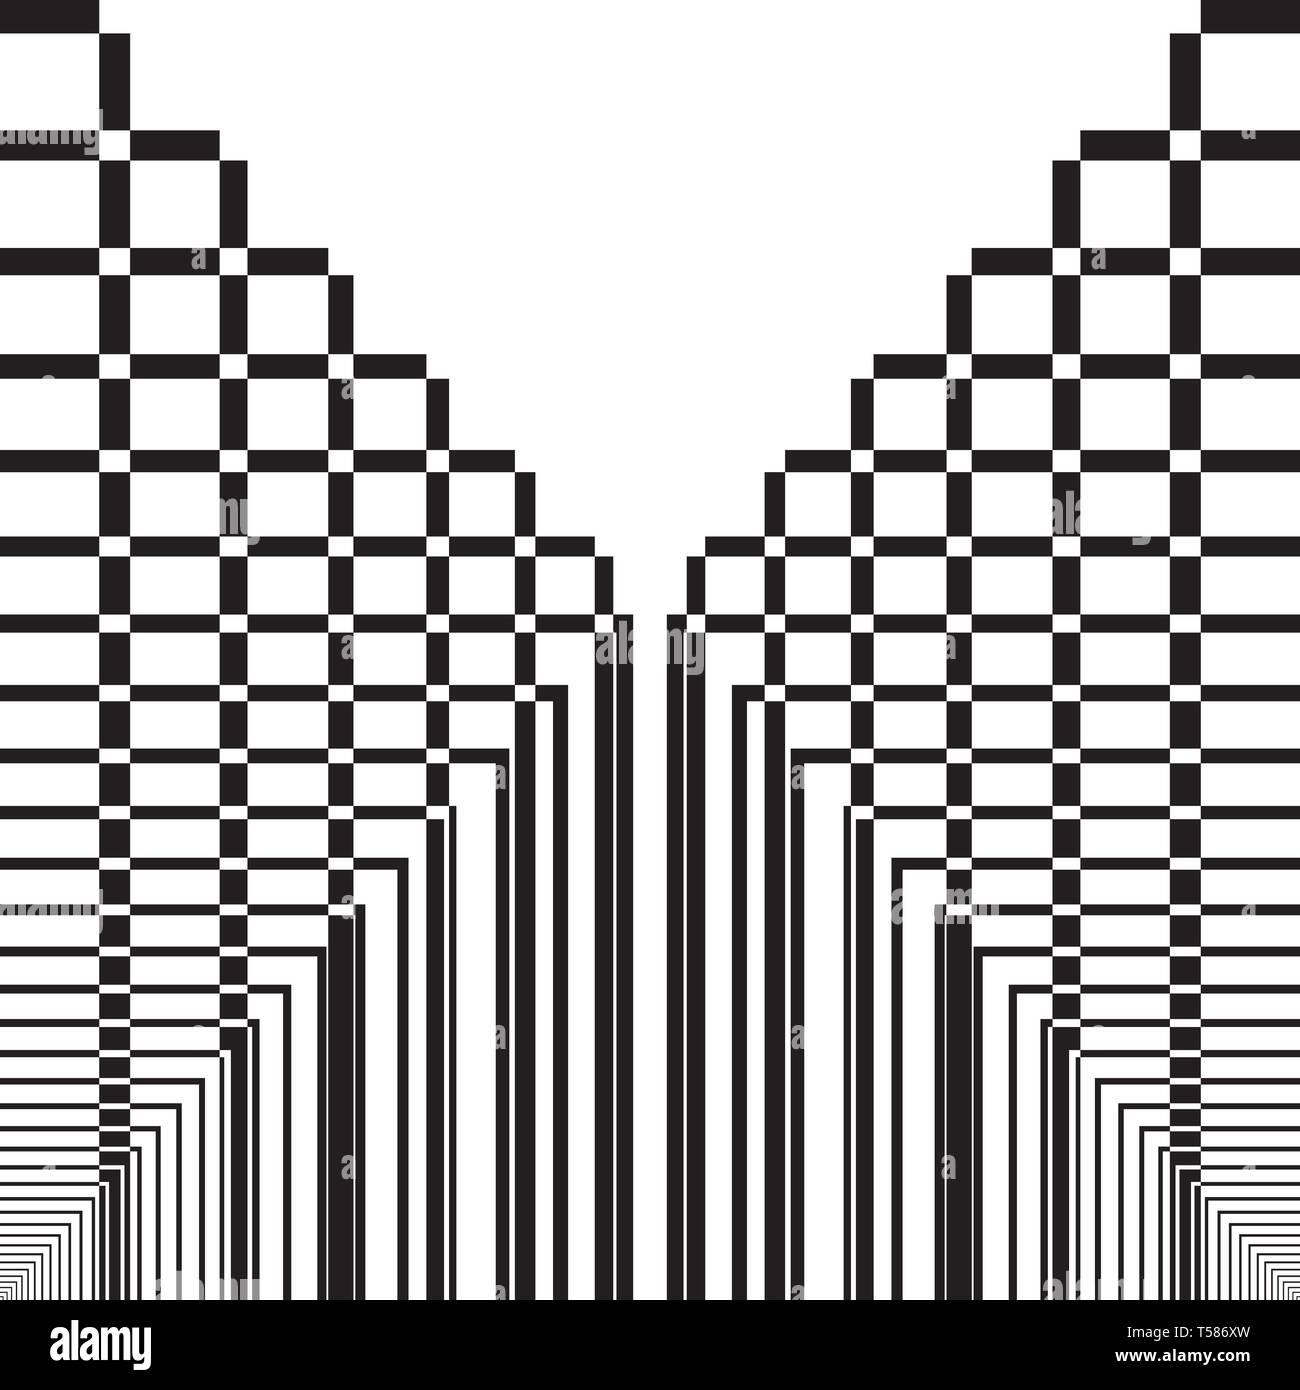 Abstract squarred arcade bridge tridimensional impression  black on transparent background designer graphic - Stock Vector